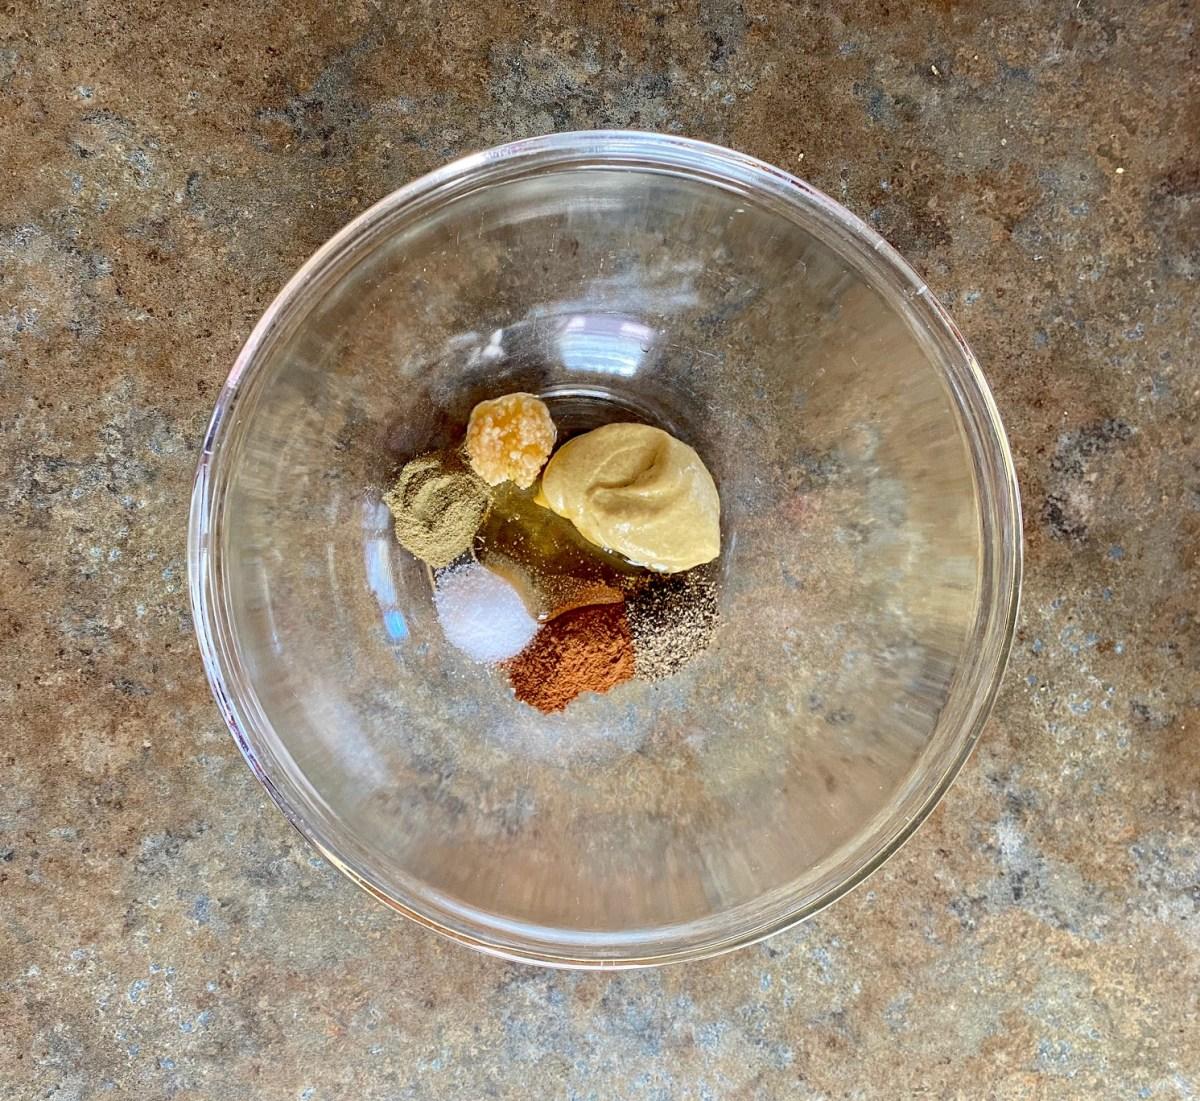 Minced garlic, Dijon mustard, honey, apple pie spice, ground pepper, thyme and salt in a small bowl. #applecideporkchops #porkchoprecipes #bonelessporkchops #dinnerrecipes #30minutesorlessdinner #porkrecipes #applecidergravy